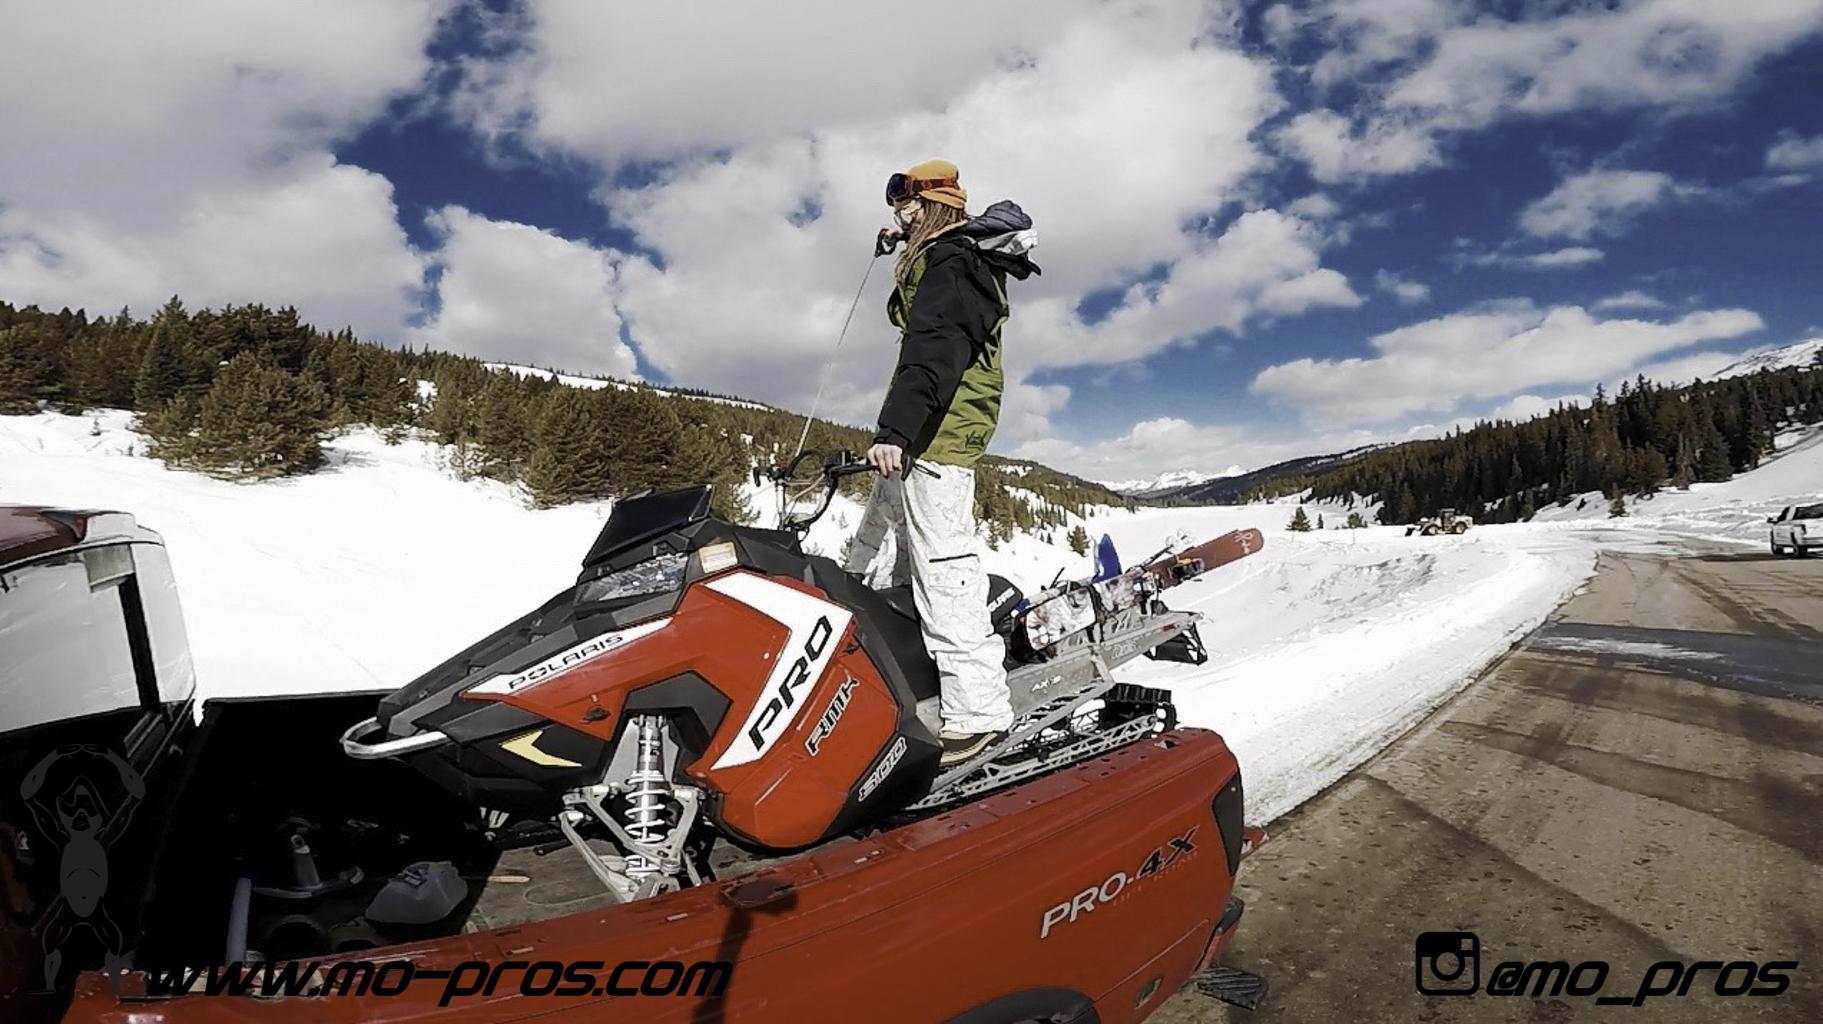 112_Tsaina Rack_Timbersled rack_Timbersled Rack_timbersled bag_snowmobile bag_Snowmobile_Snowboarding_Snowboard rack_snowboard_Snowbike_Ski_Rack_LinQ Snowboard Ski_Gun Rack_Gear_gas Rack_Cheetah Fact.jpg